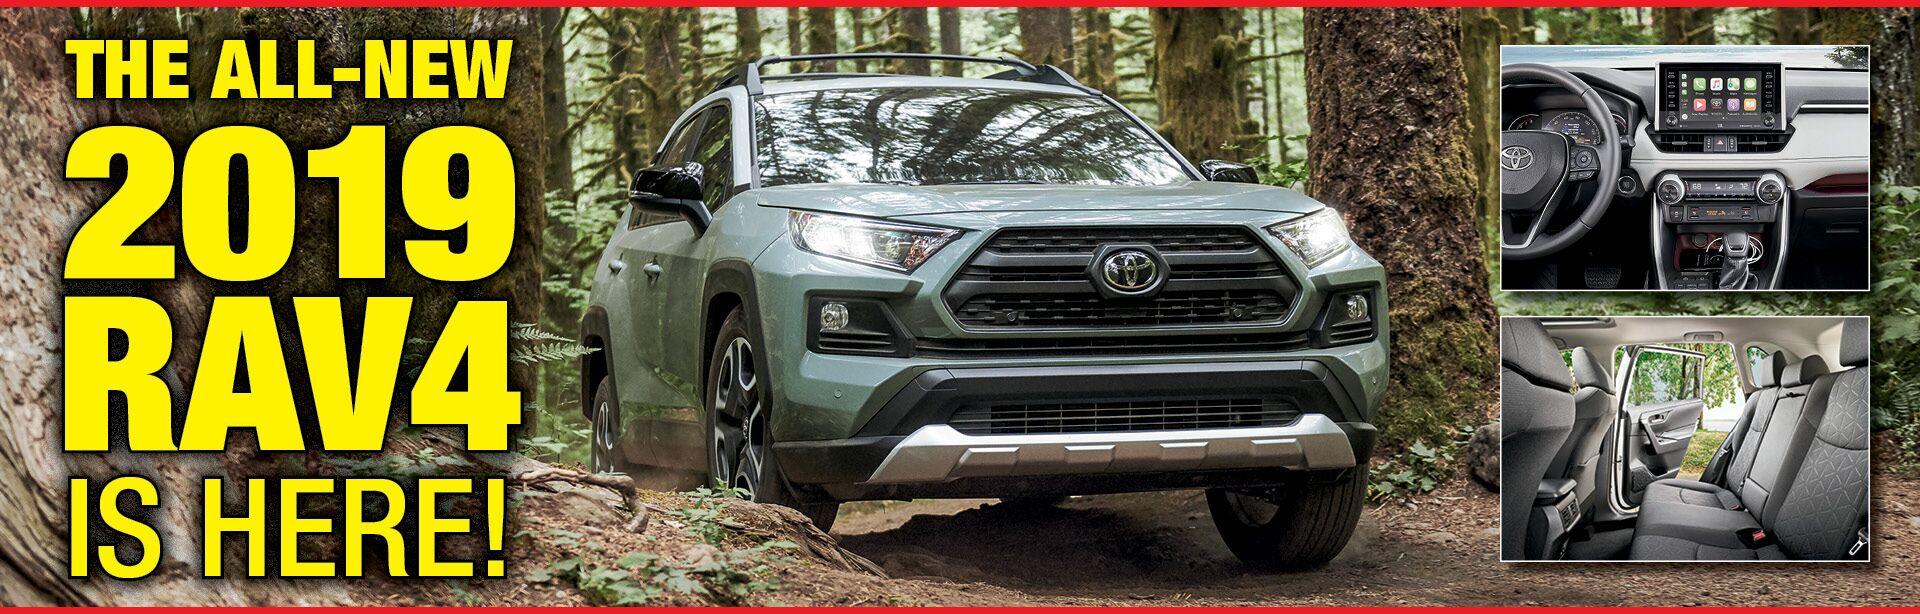 New Toyota Tundra Moline IL